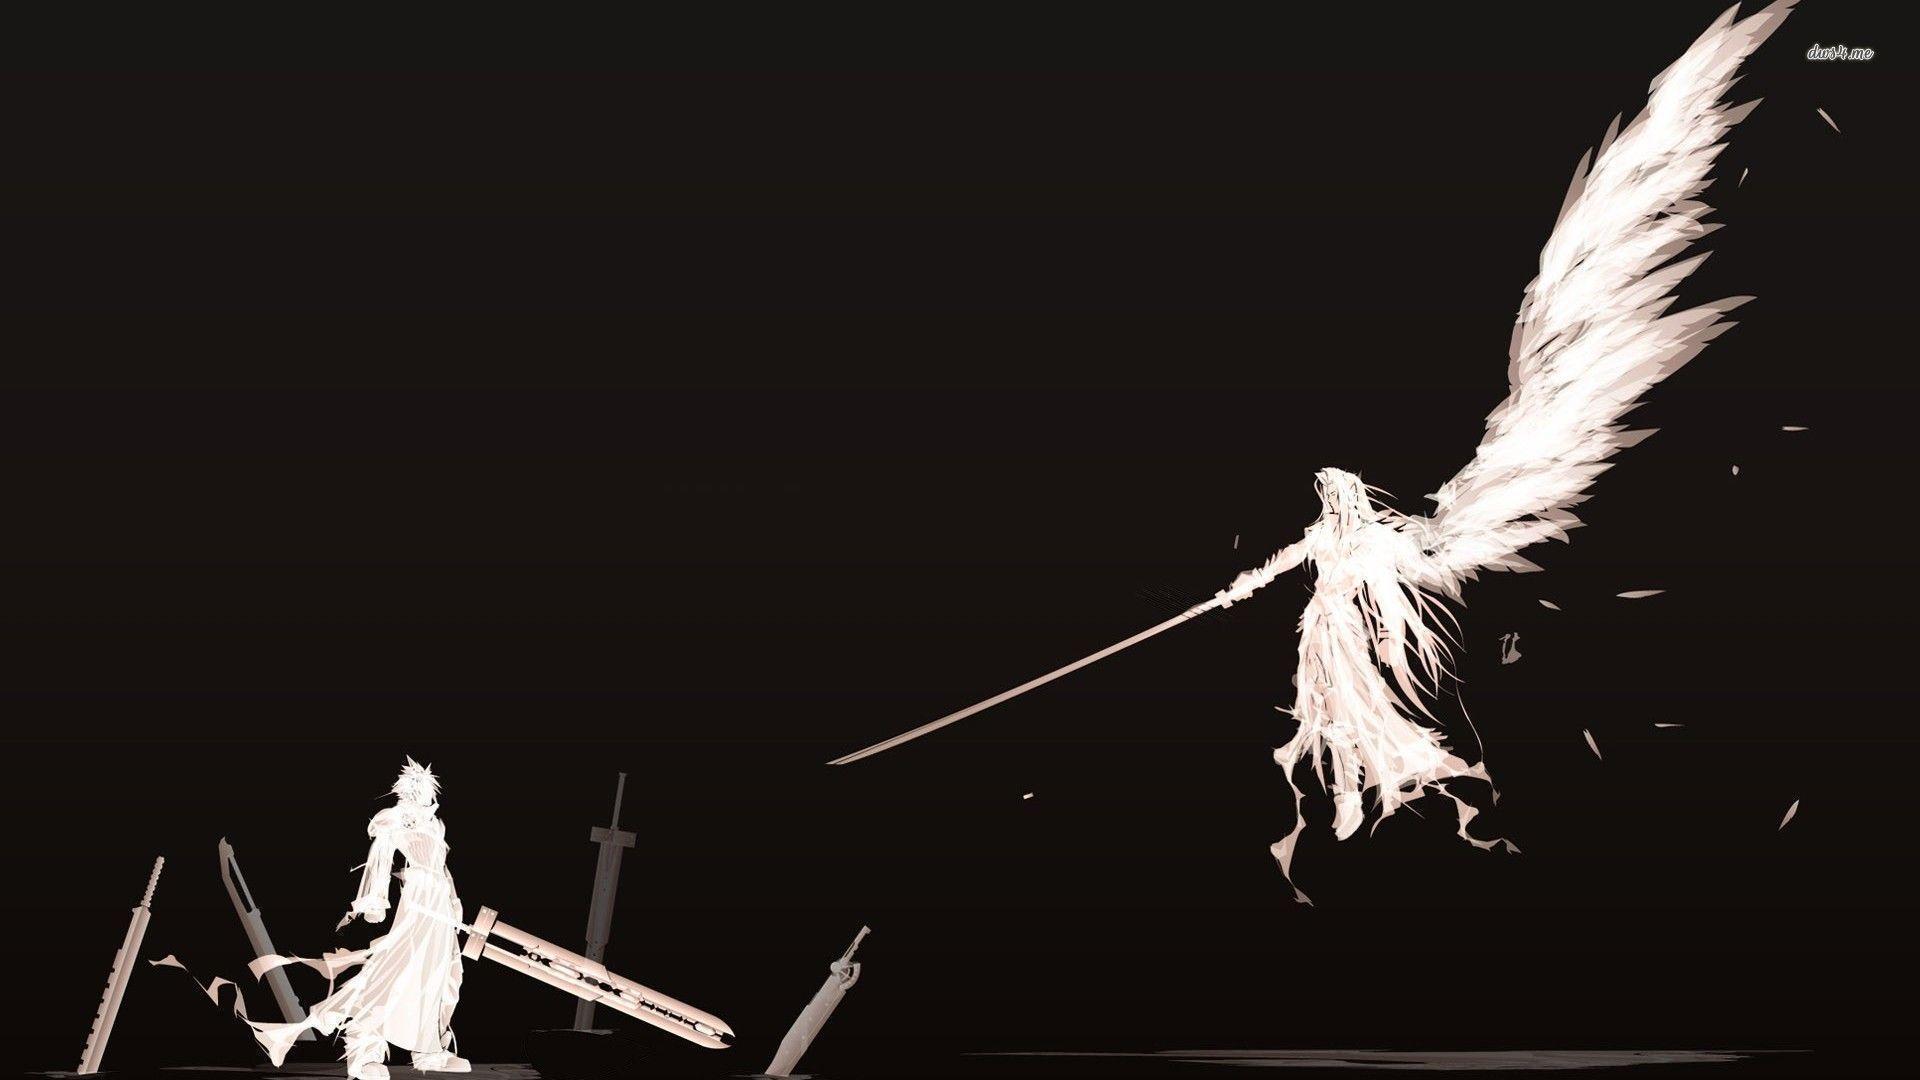 Final Fantasy 7 Sephiroth Wallpapers